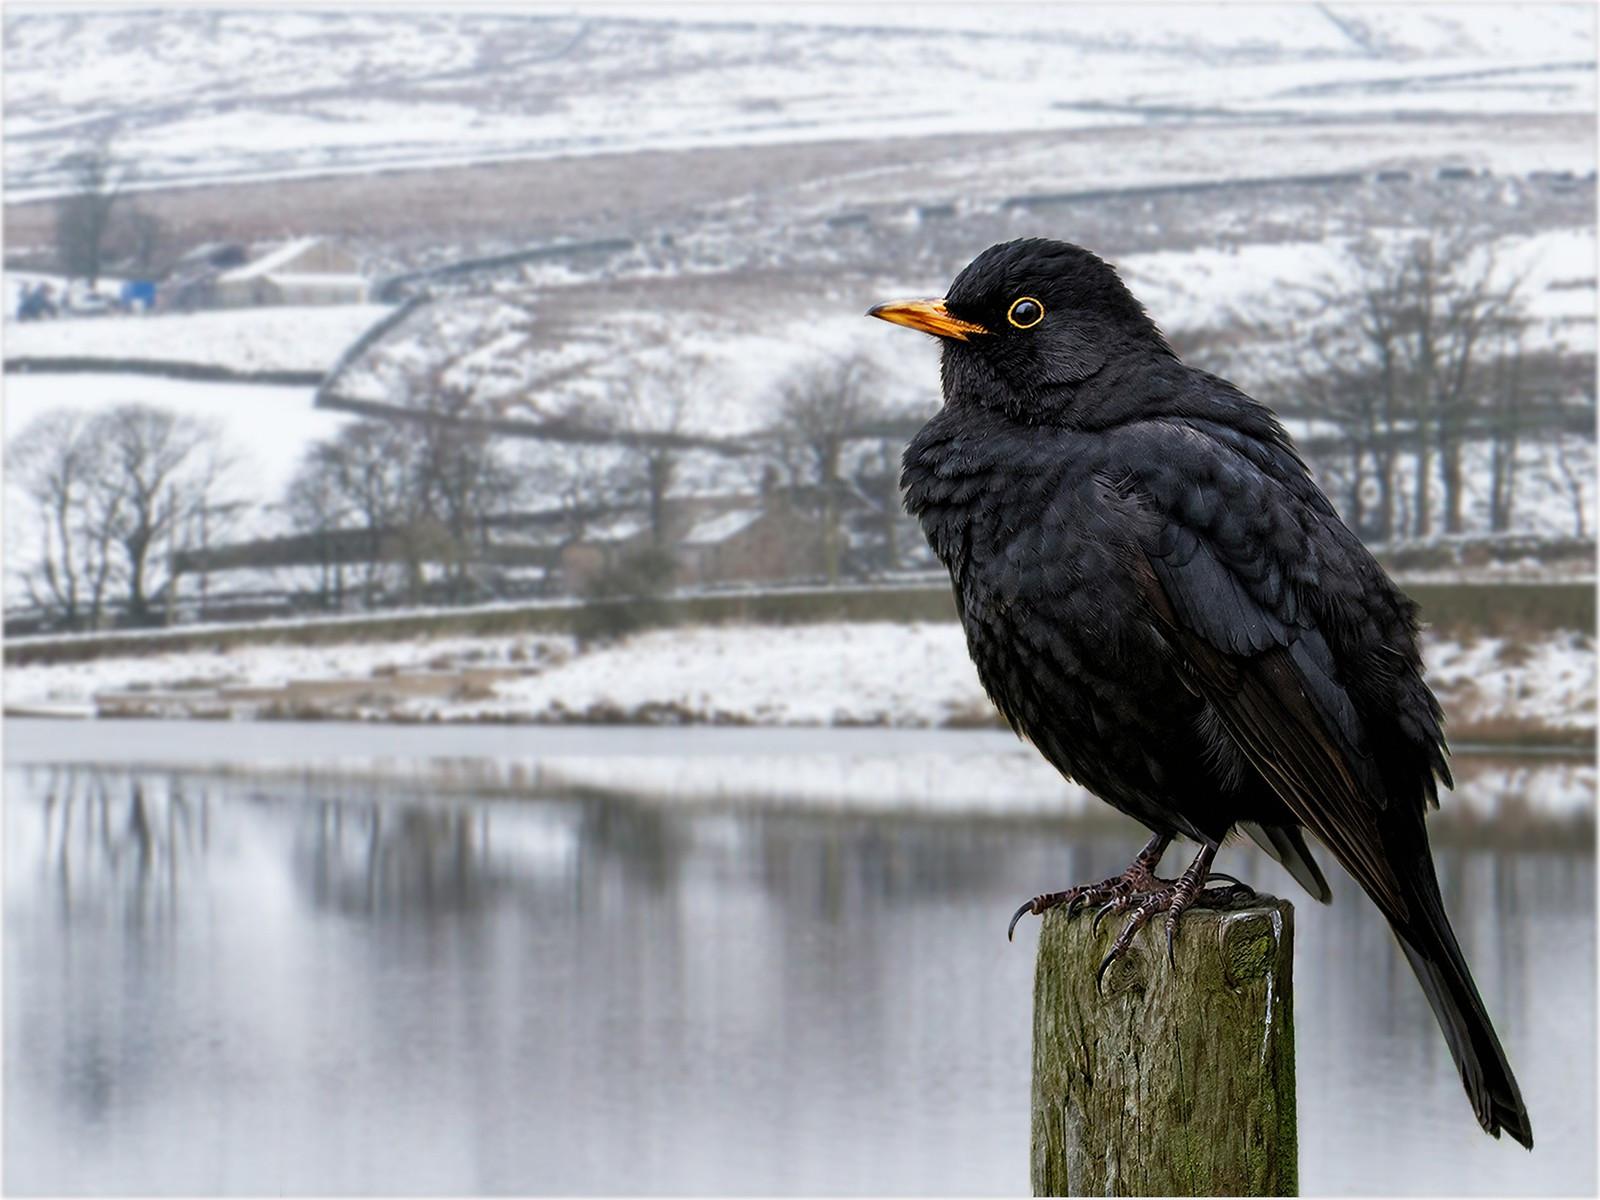 31. Blackbird in Winter